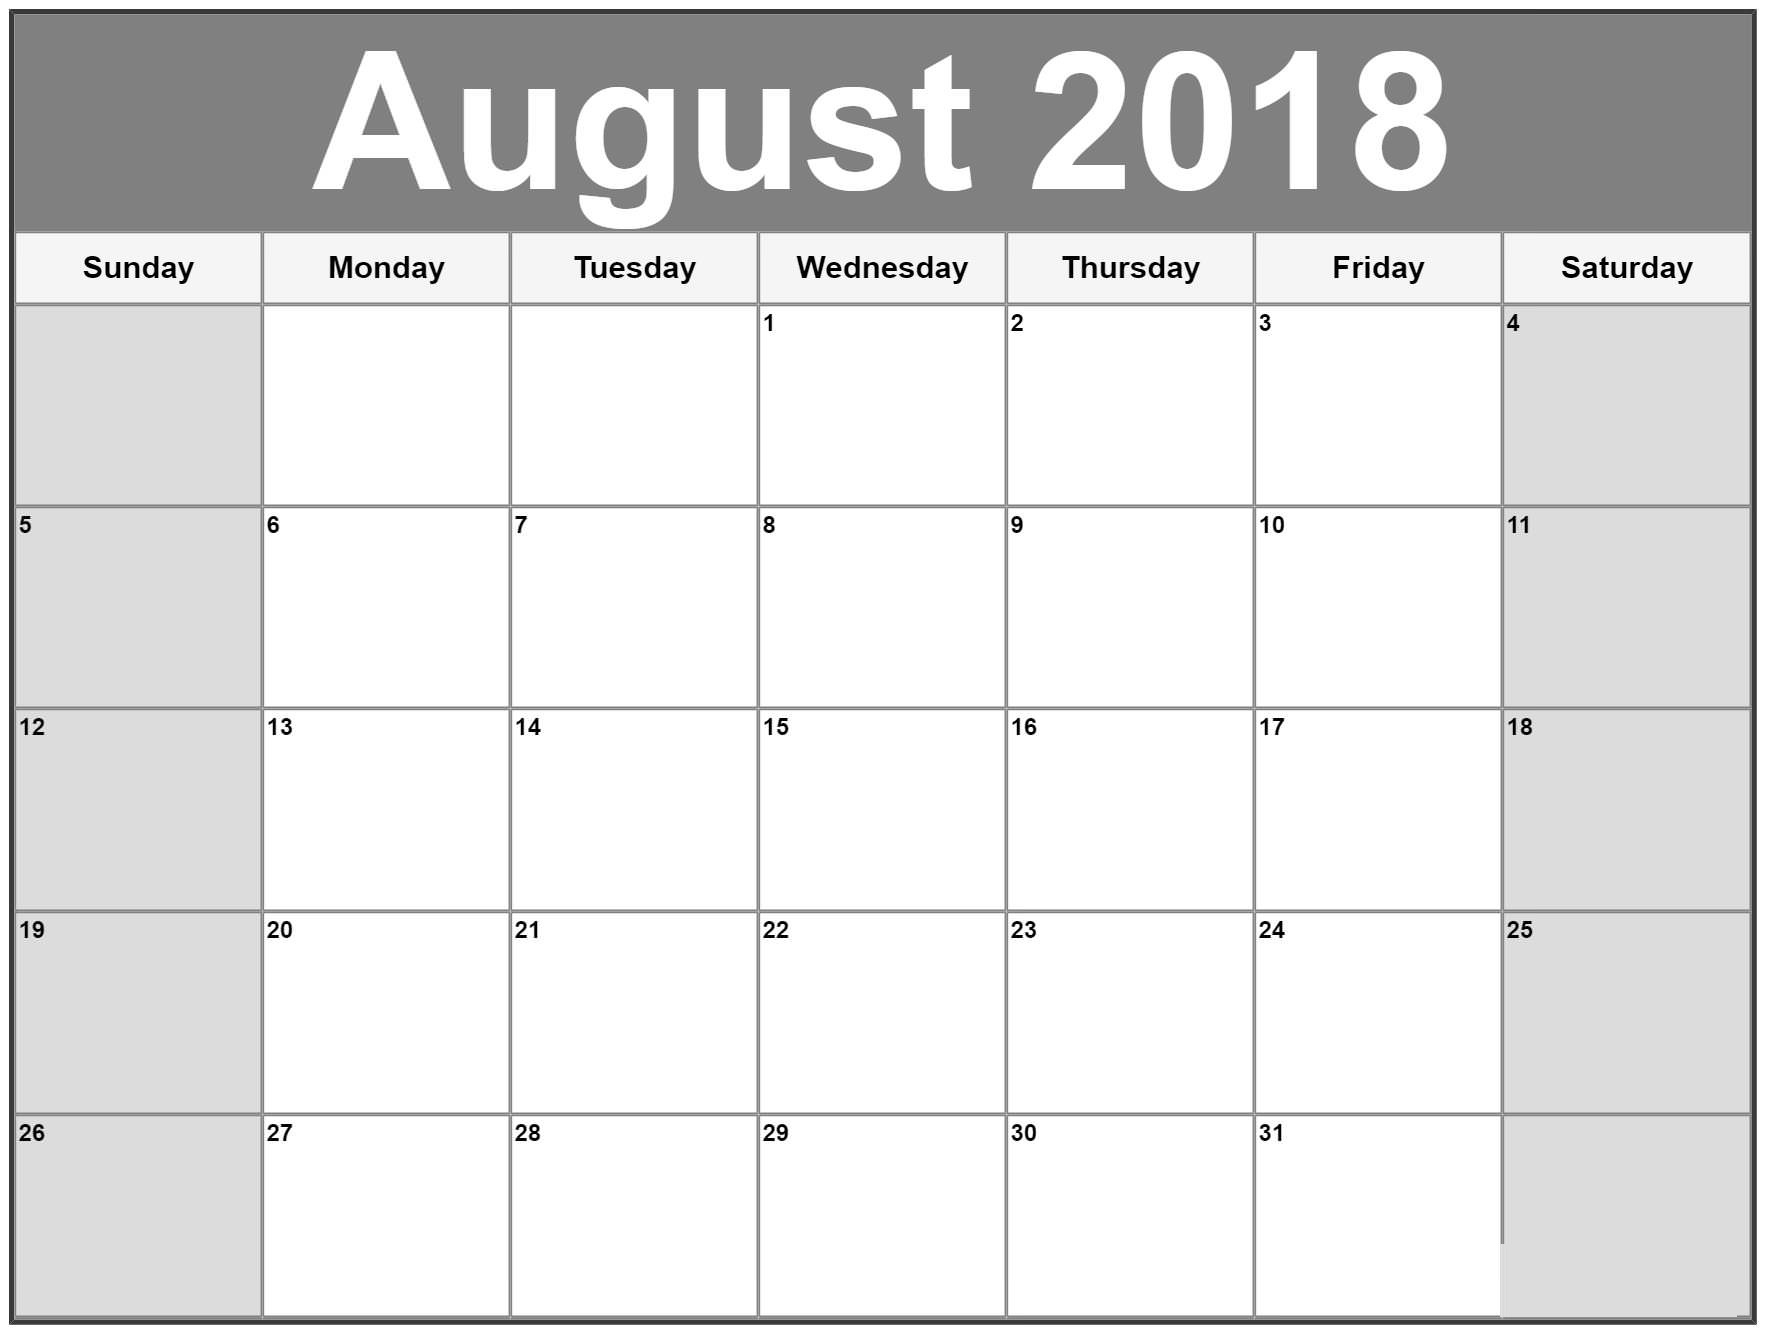 calendar august 2018 google printable printable calendar template Calendar August 2018 Printable Schedule erdferdf